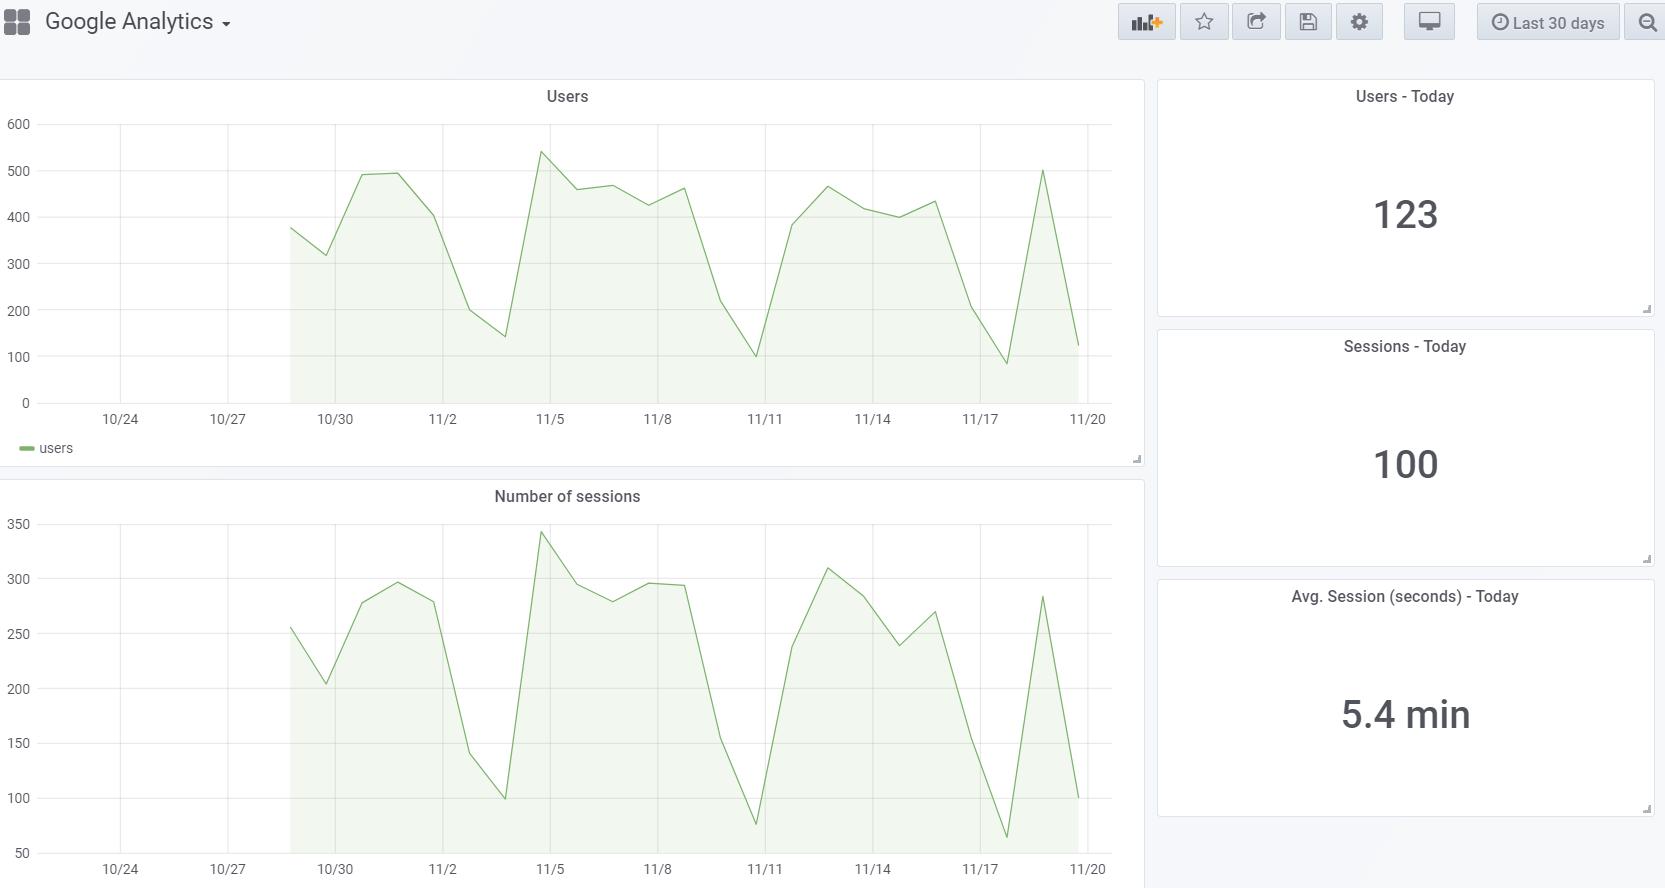 How to integrate Google Analytics into Grafana's dashboard